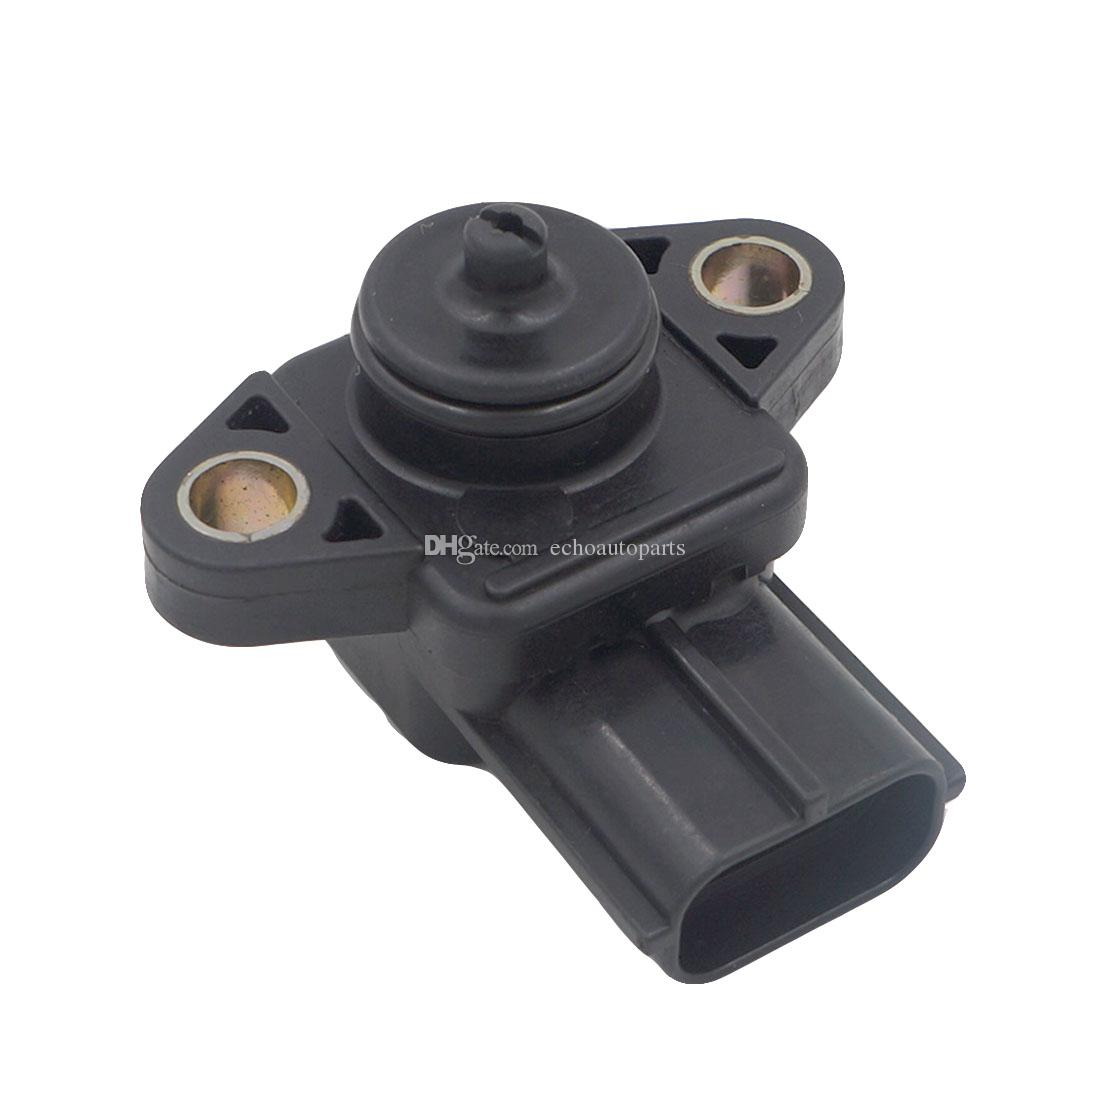 Brand New Intake Manifold Pressure Sensor MAP Sensor Fit For Suzuki Liana  1 6 E1T28571A Geniune